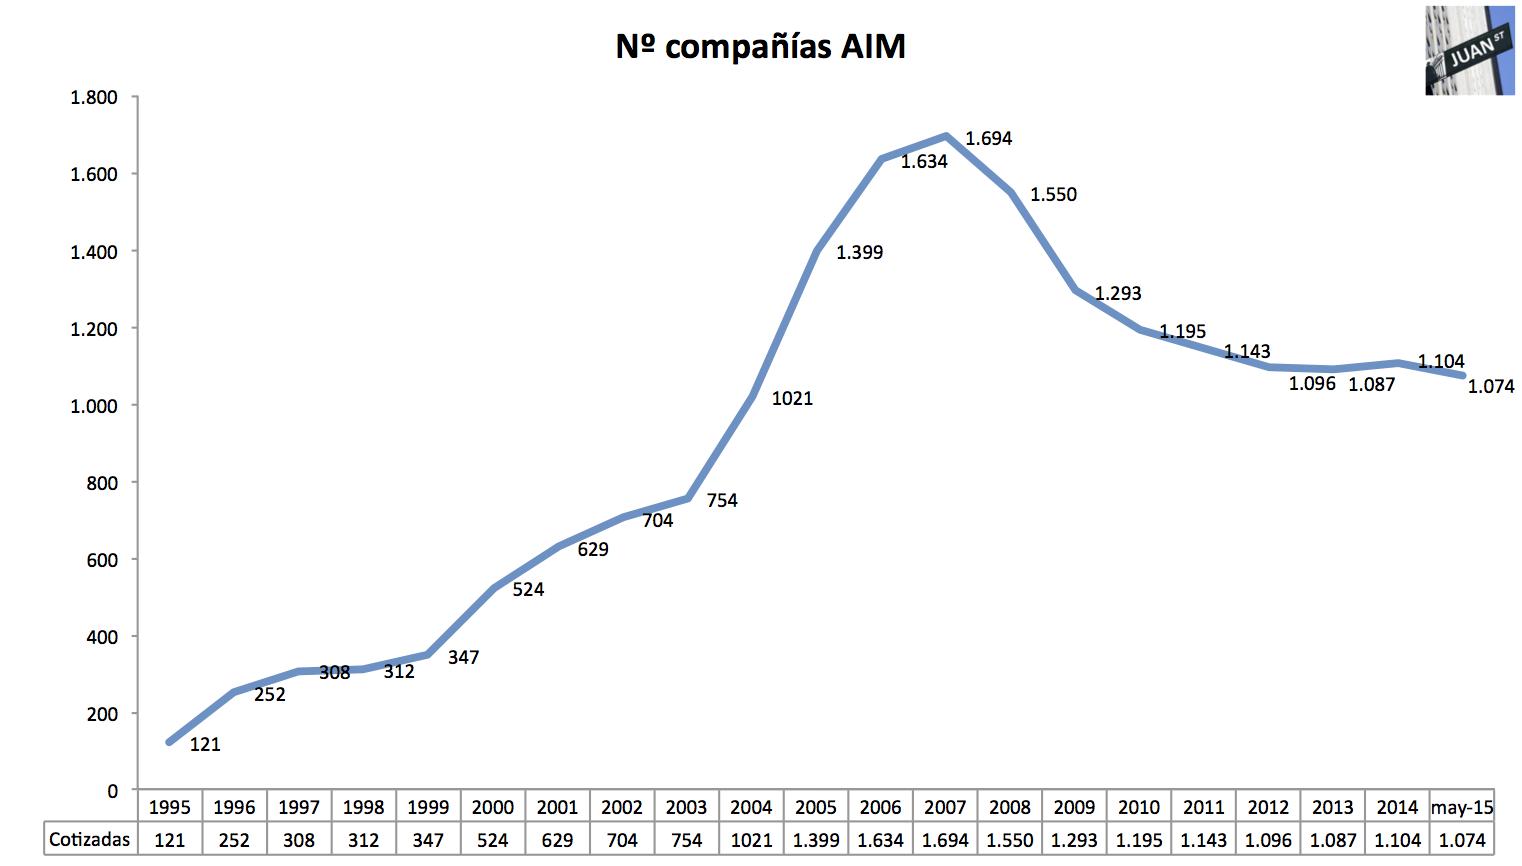 aim-cotizadas-junio-1995-mayo-2015